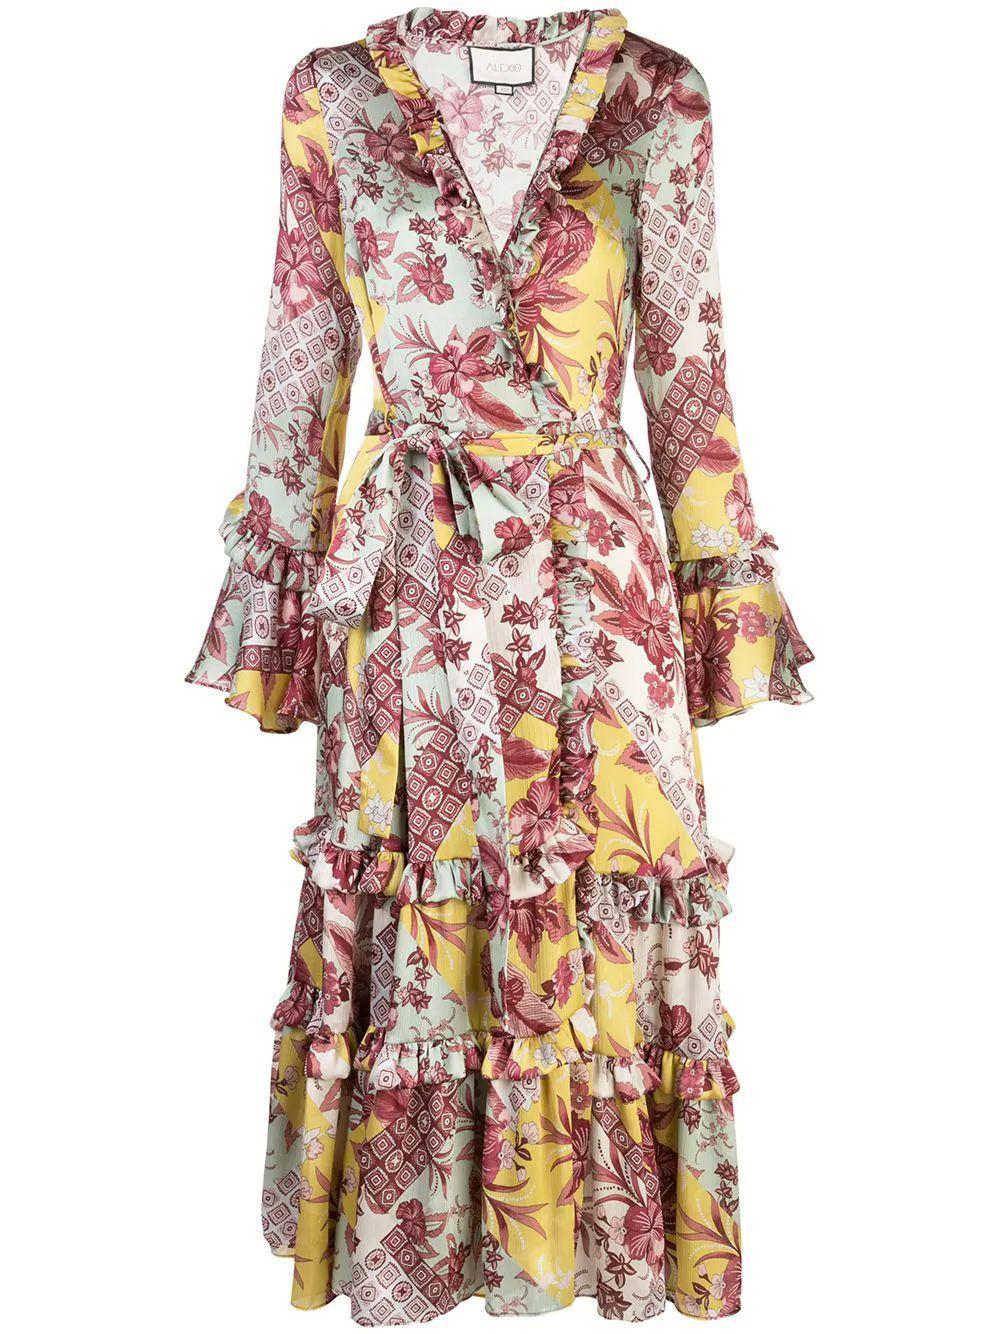 Wiera Long Sleeve Printed Wrap Dress Item # A1200443-6174